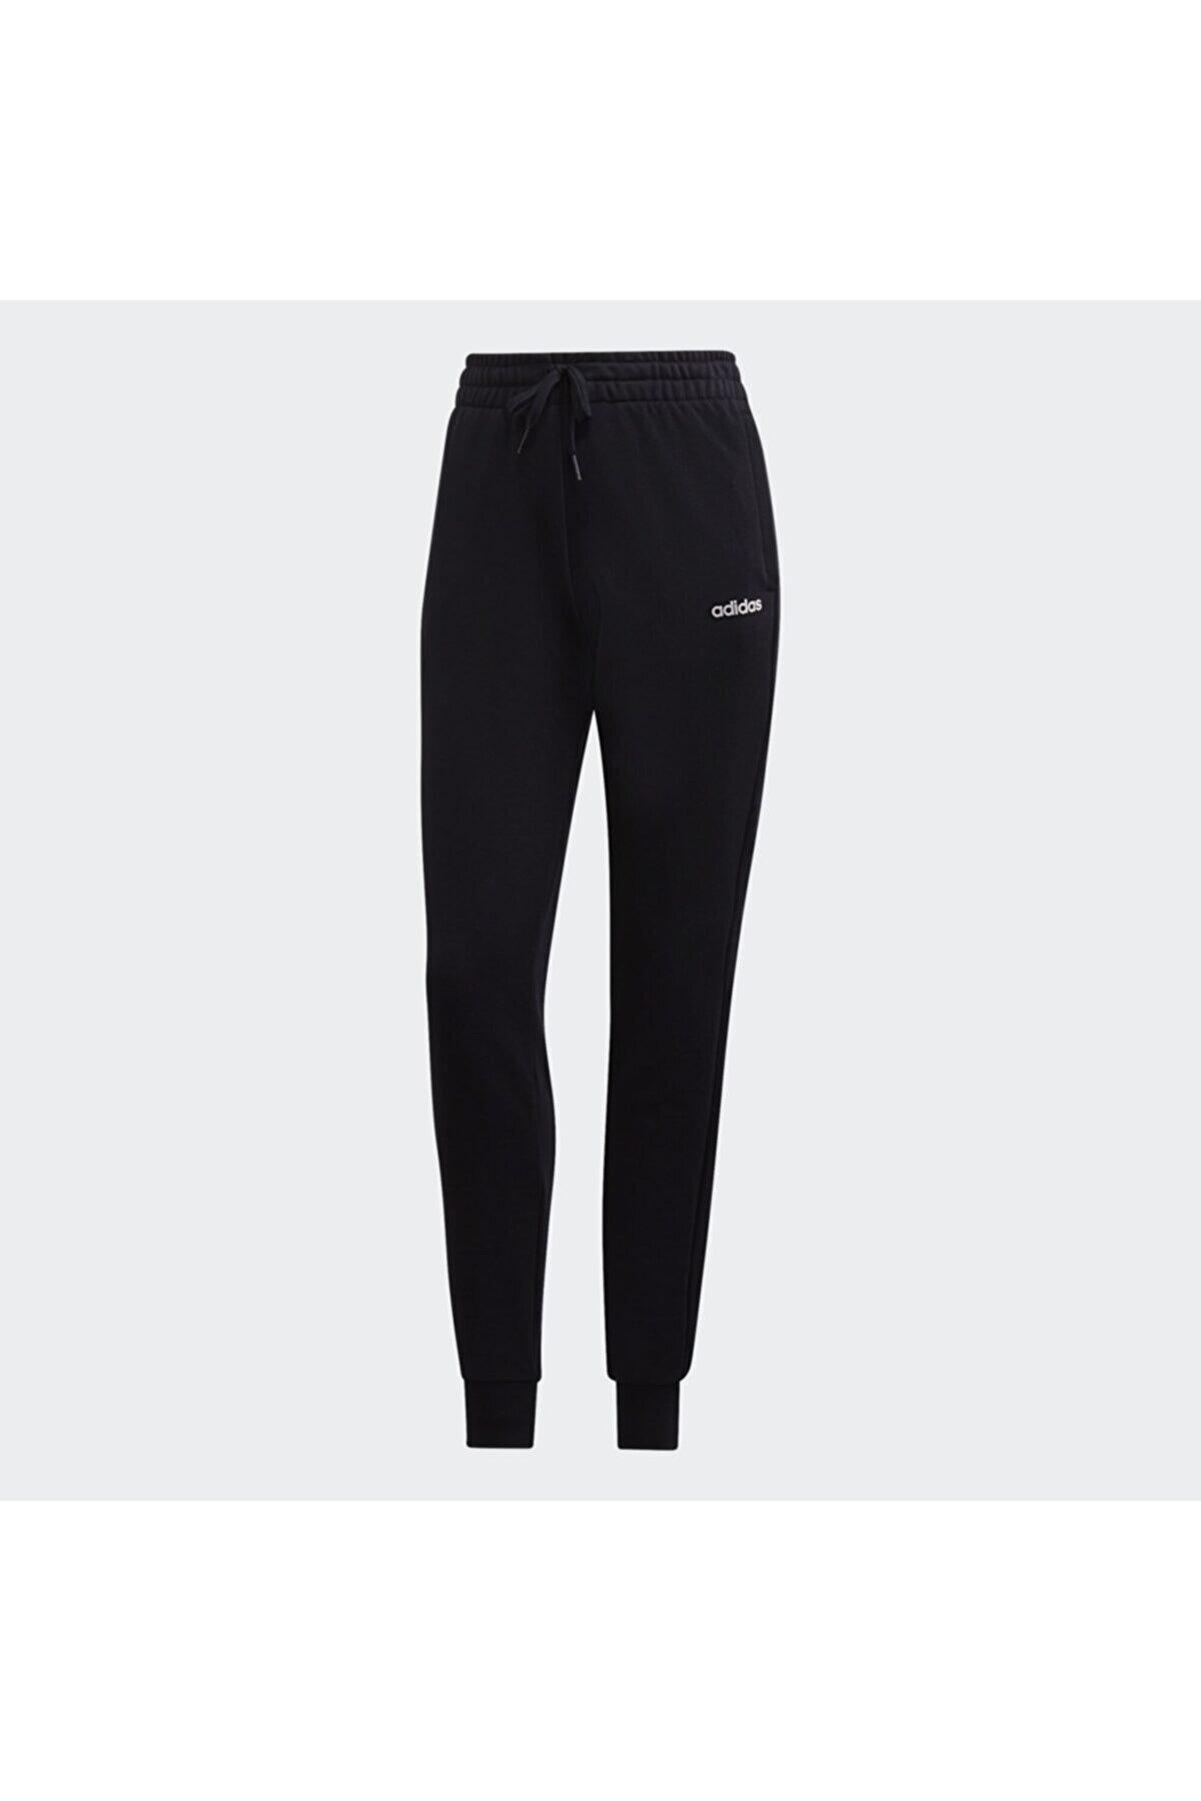 adidas W E PLN PANT Siyah Kadın Eşofman 100664227